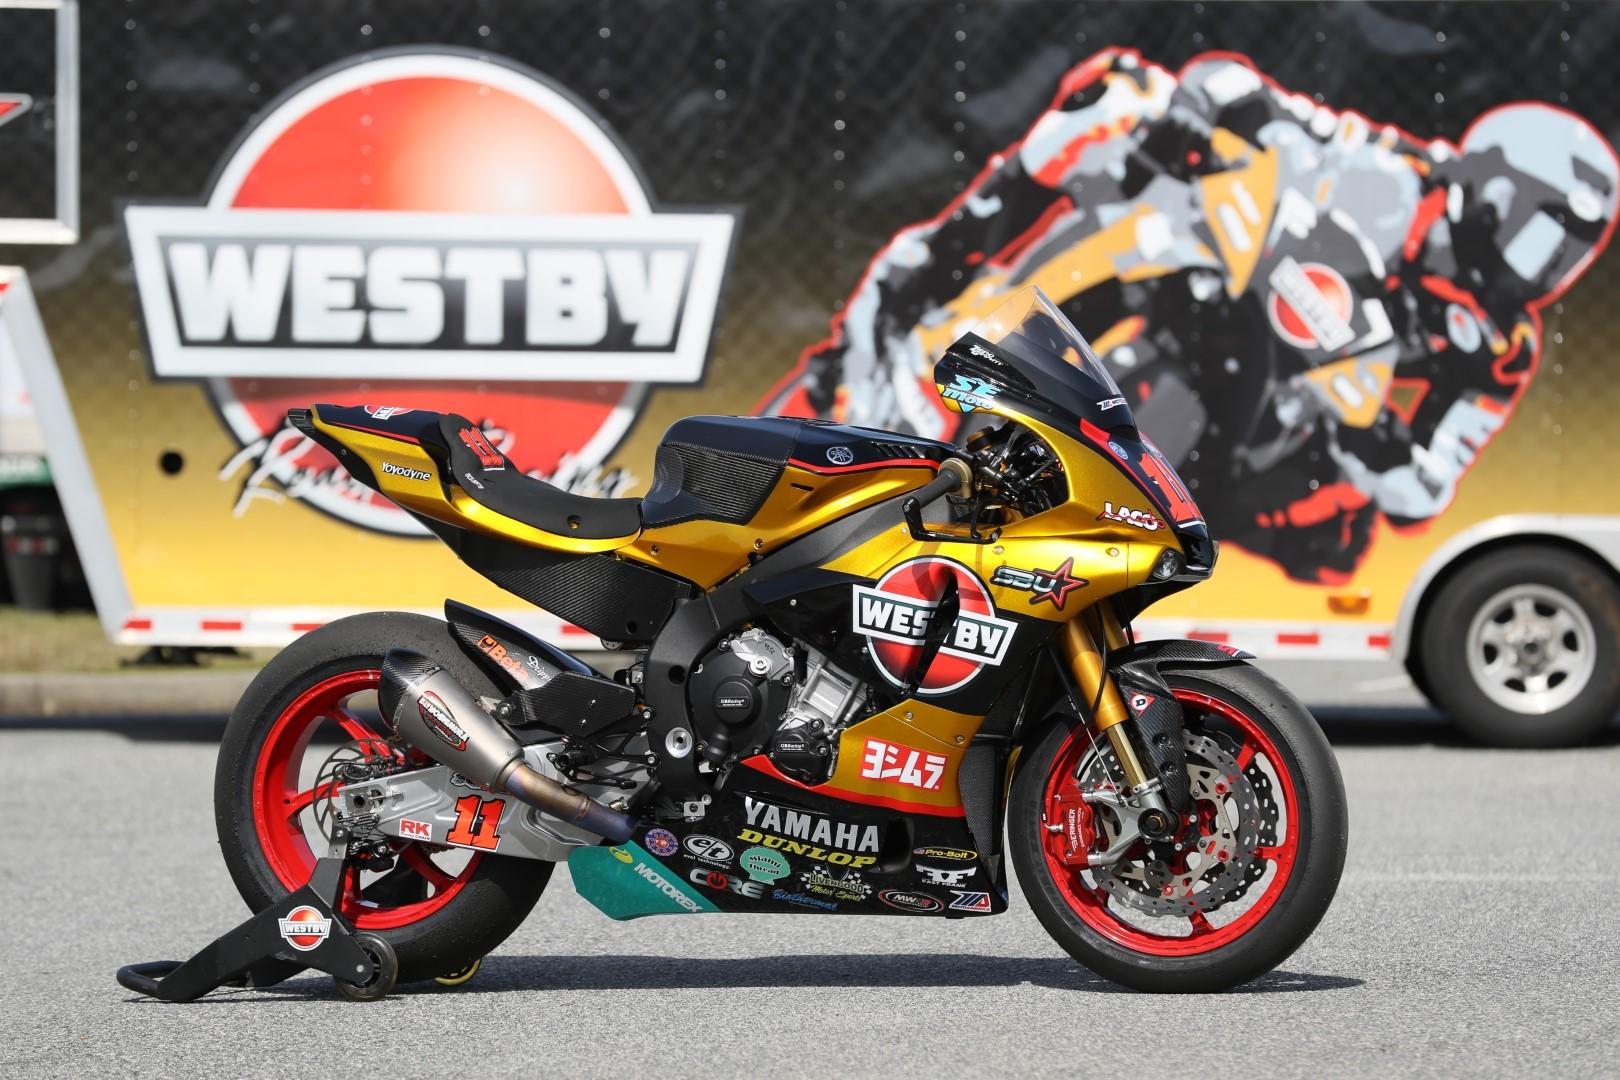 Yoshimura 2015-20 Yamaha YZF-R1 Works Superbike Full Exhaust System